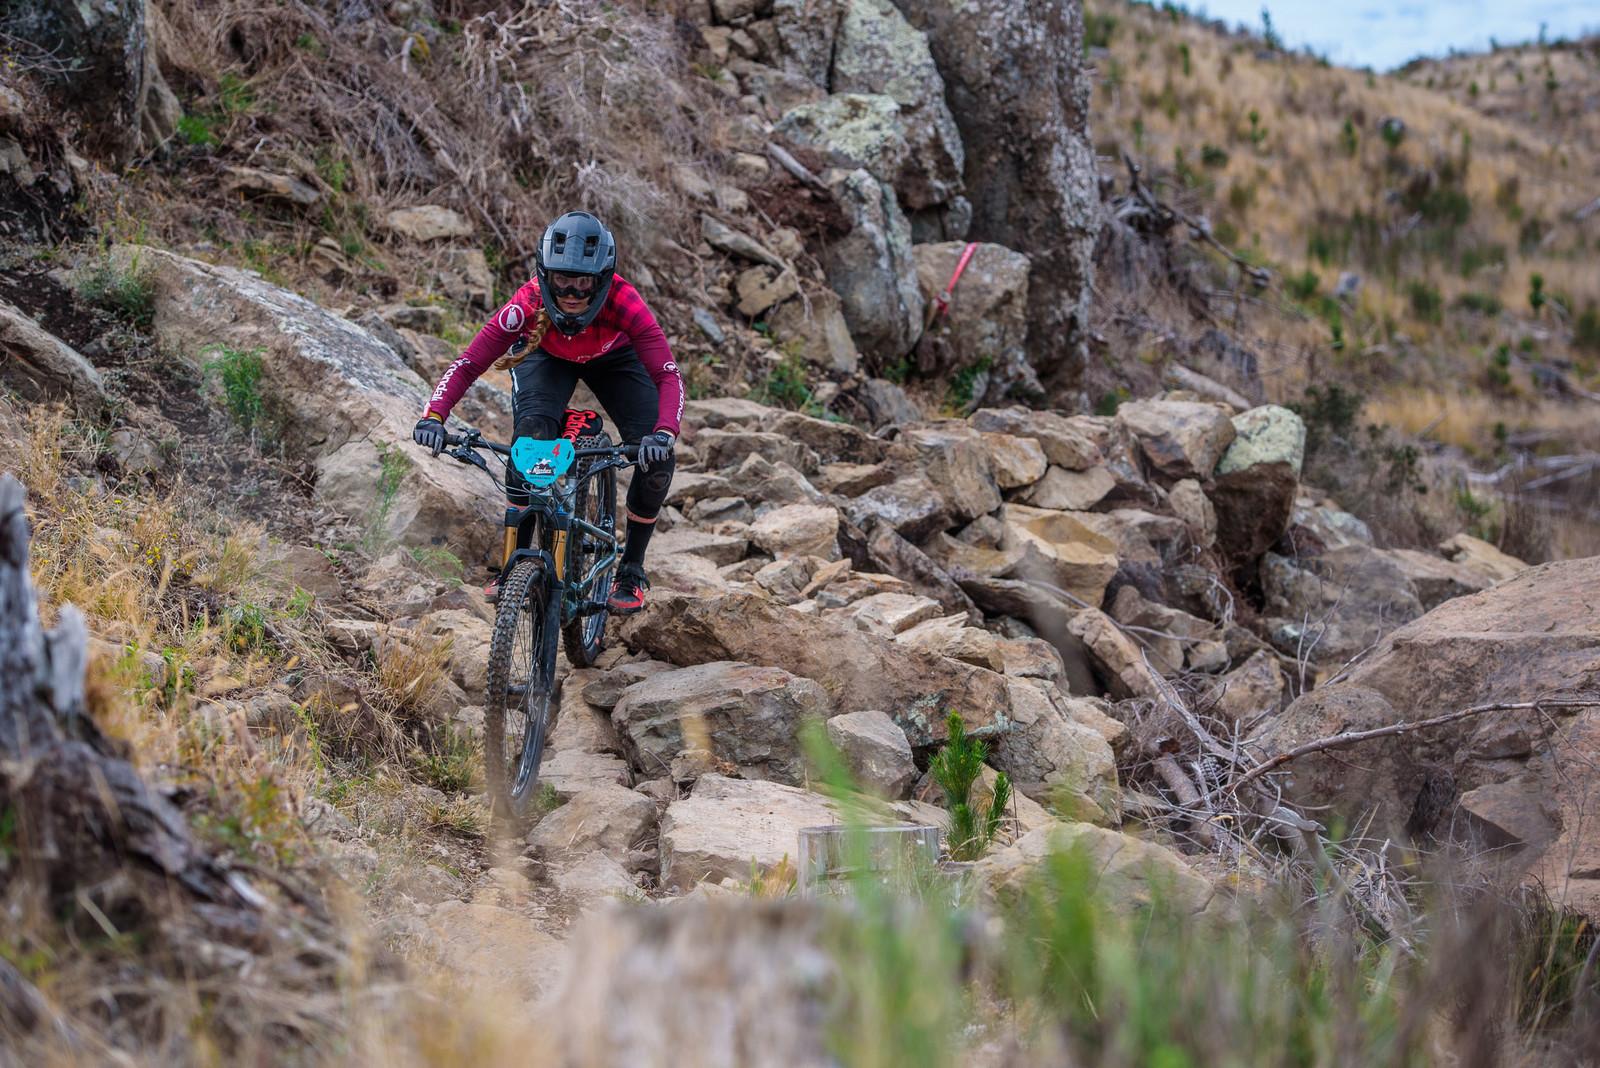 NZenduro19 day 3 DShaw-8584 - 2019 NZ Enduro Day 3 Photo Gallery - Mountain Biking Pictures - Vital MTB